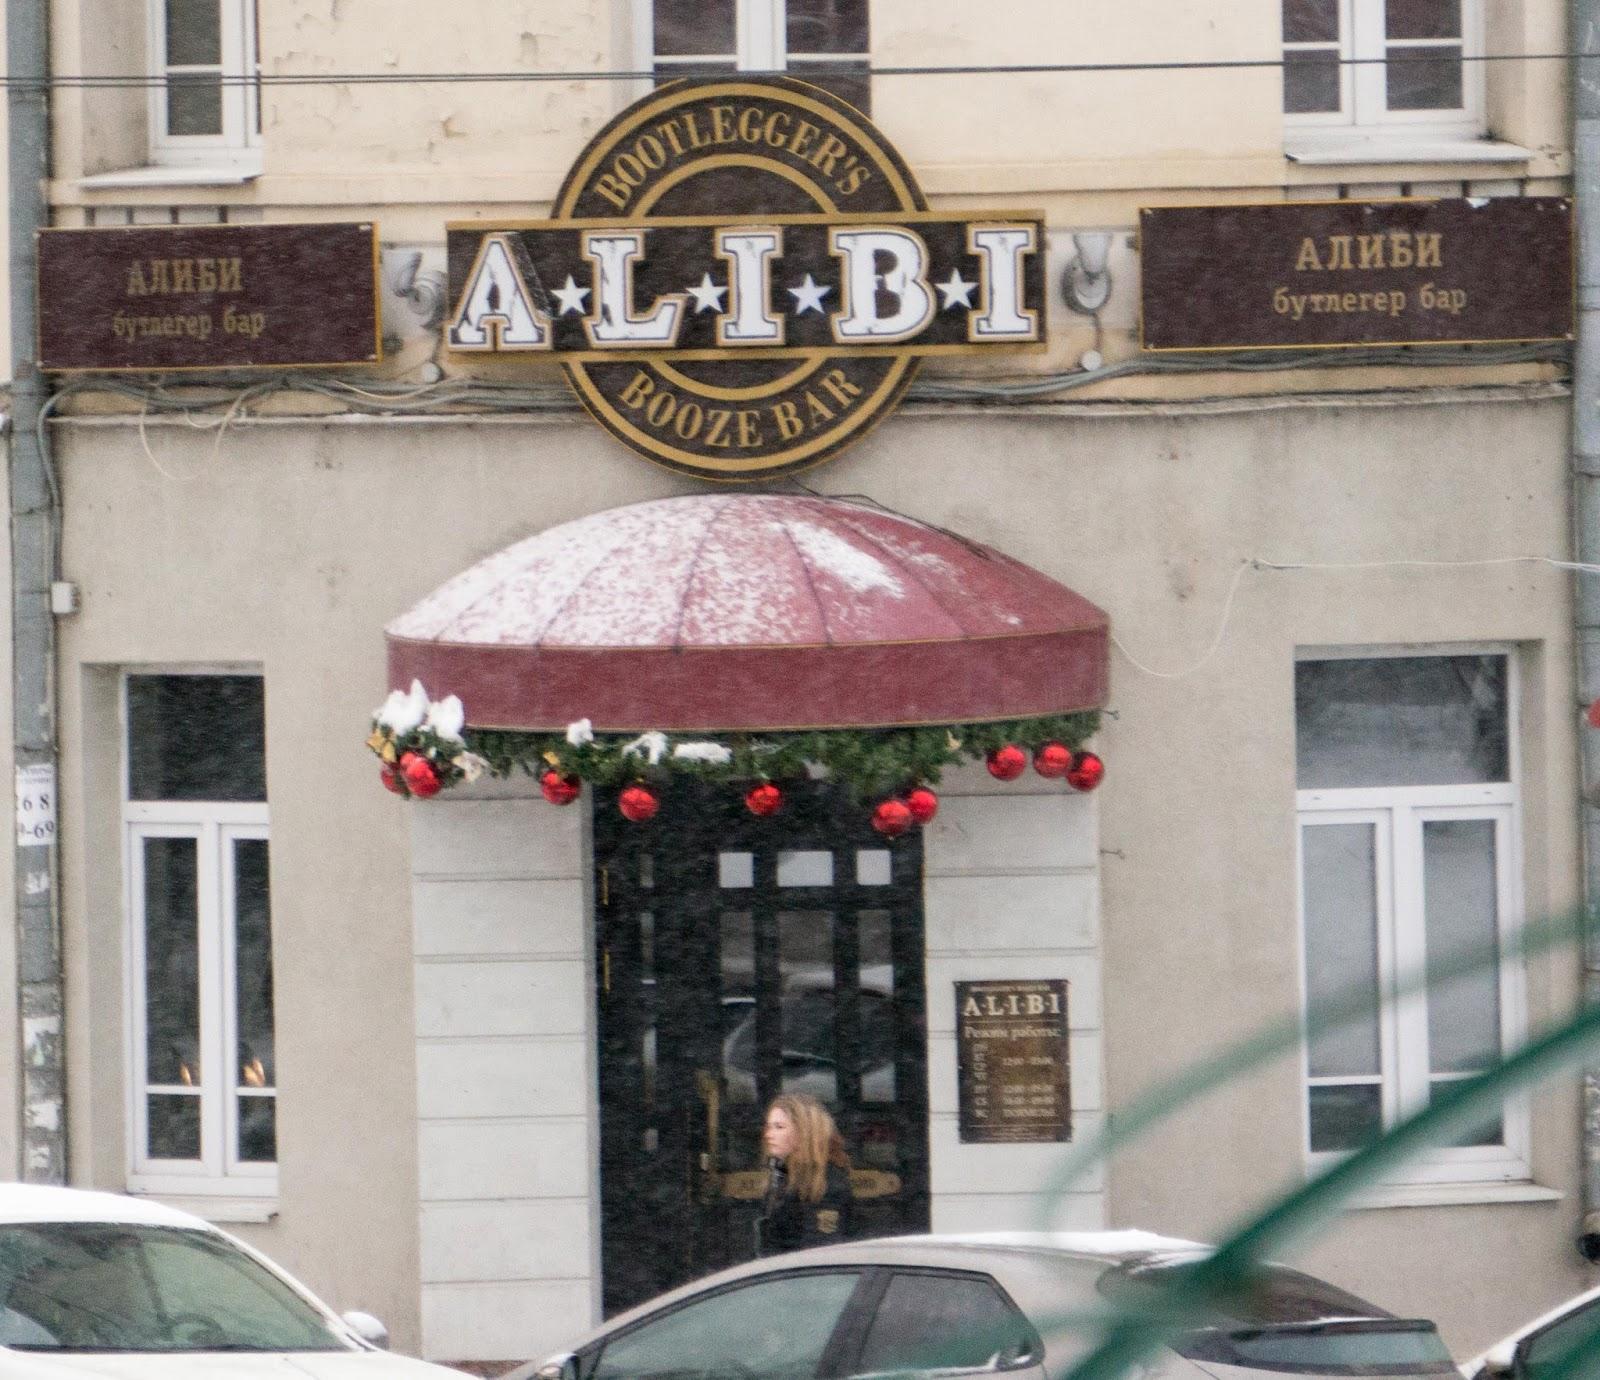 Бизнес на алиби: как открыть алиби-агентство